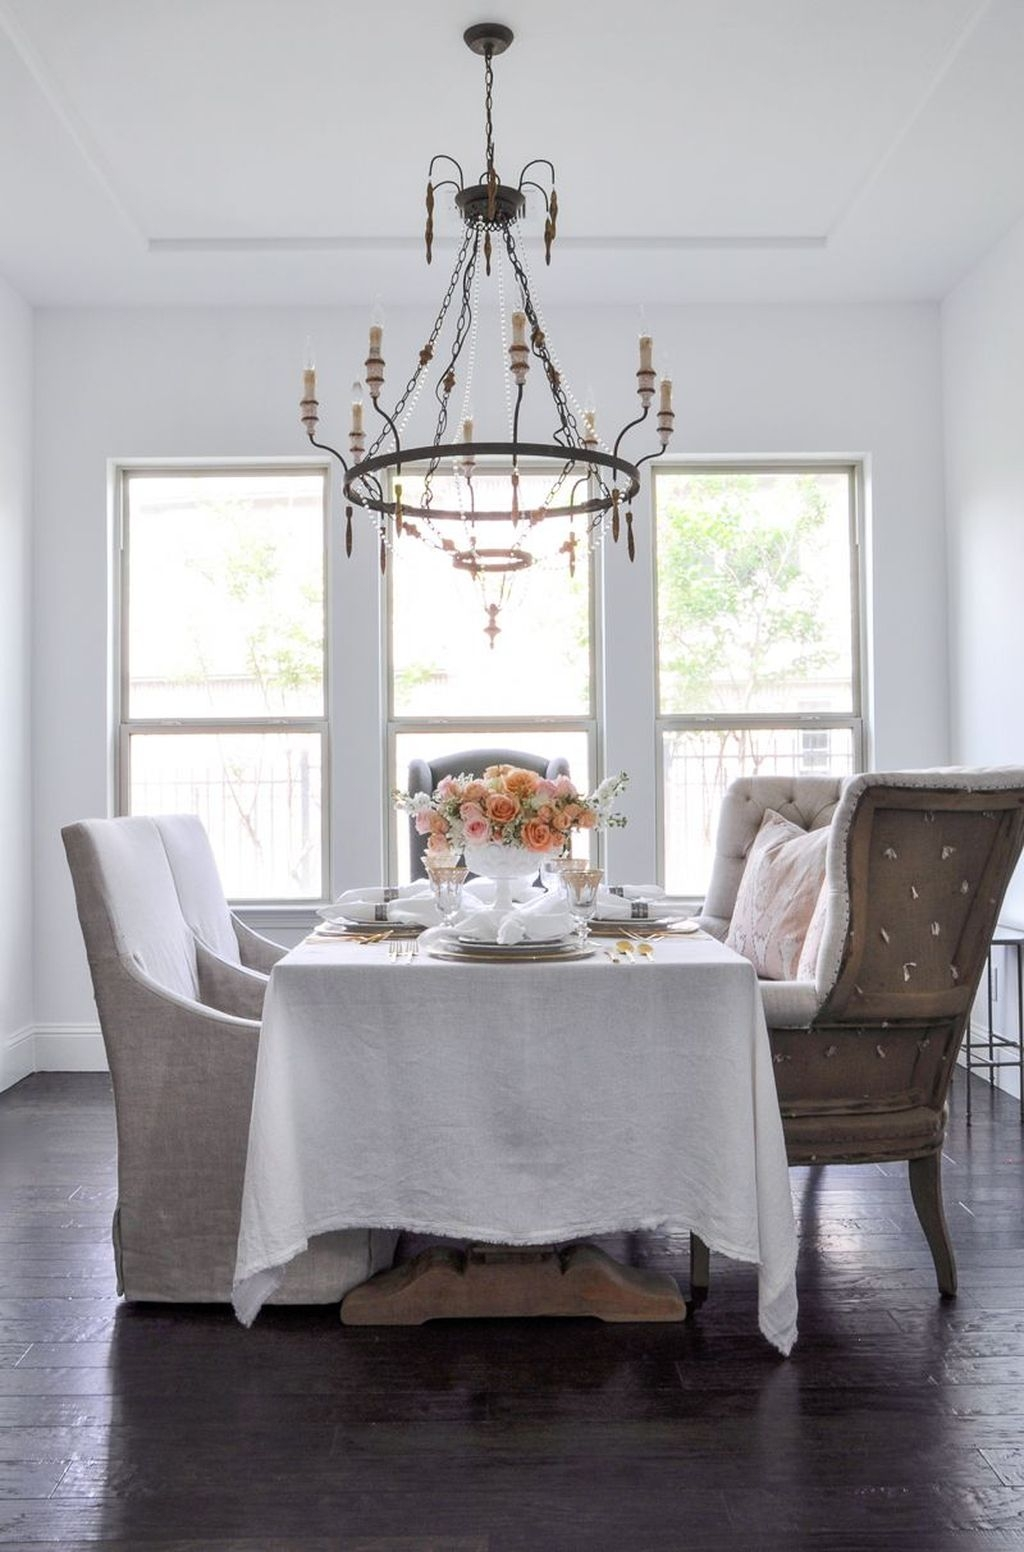 Sweet Romantic Dining Room Decor 23